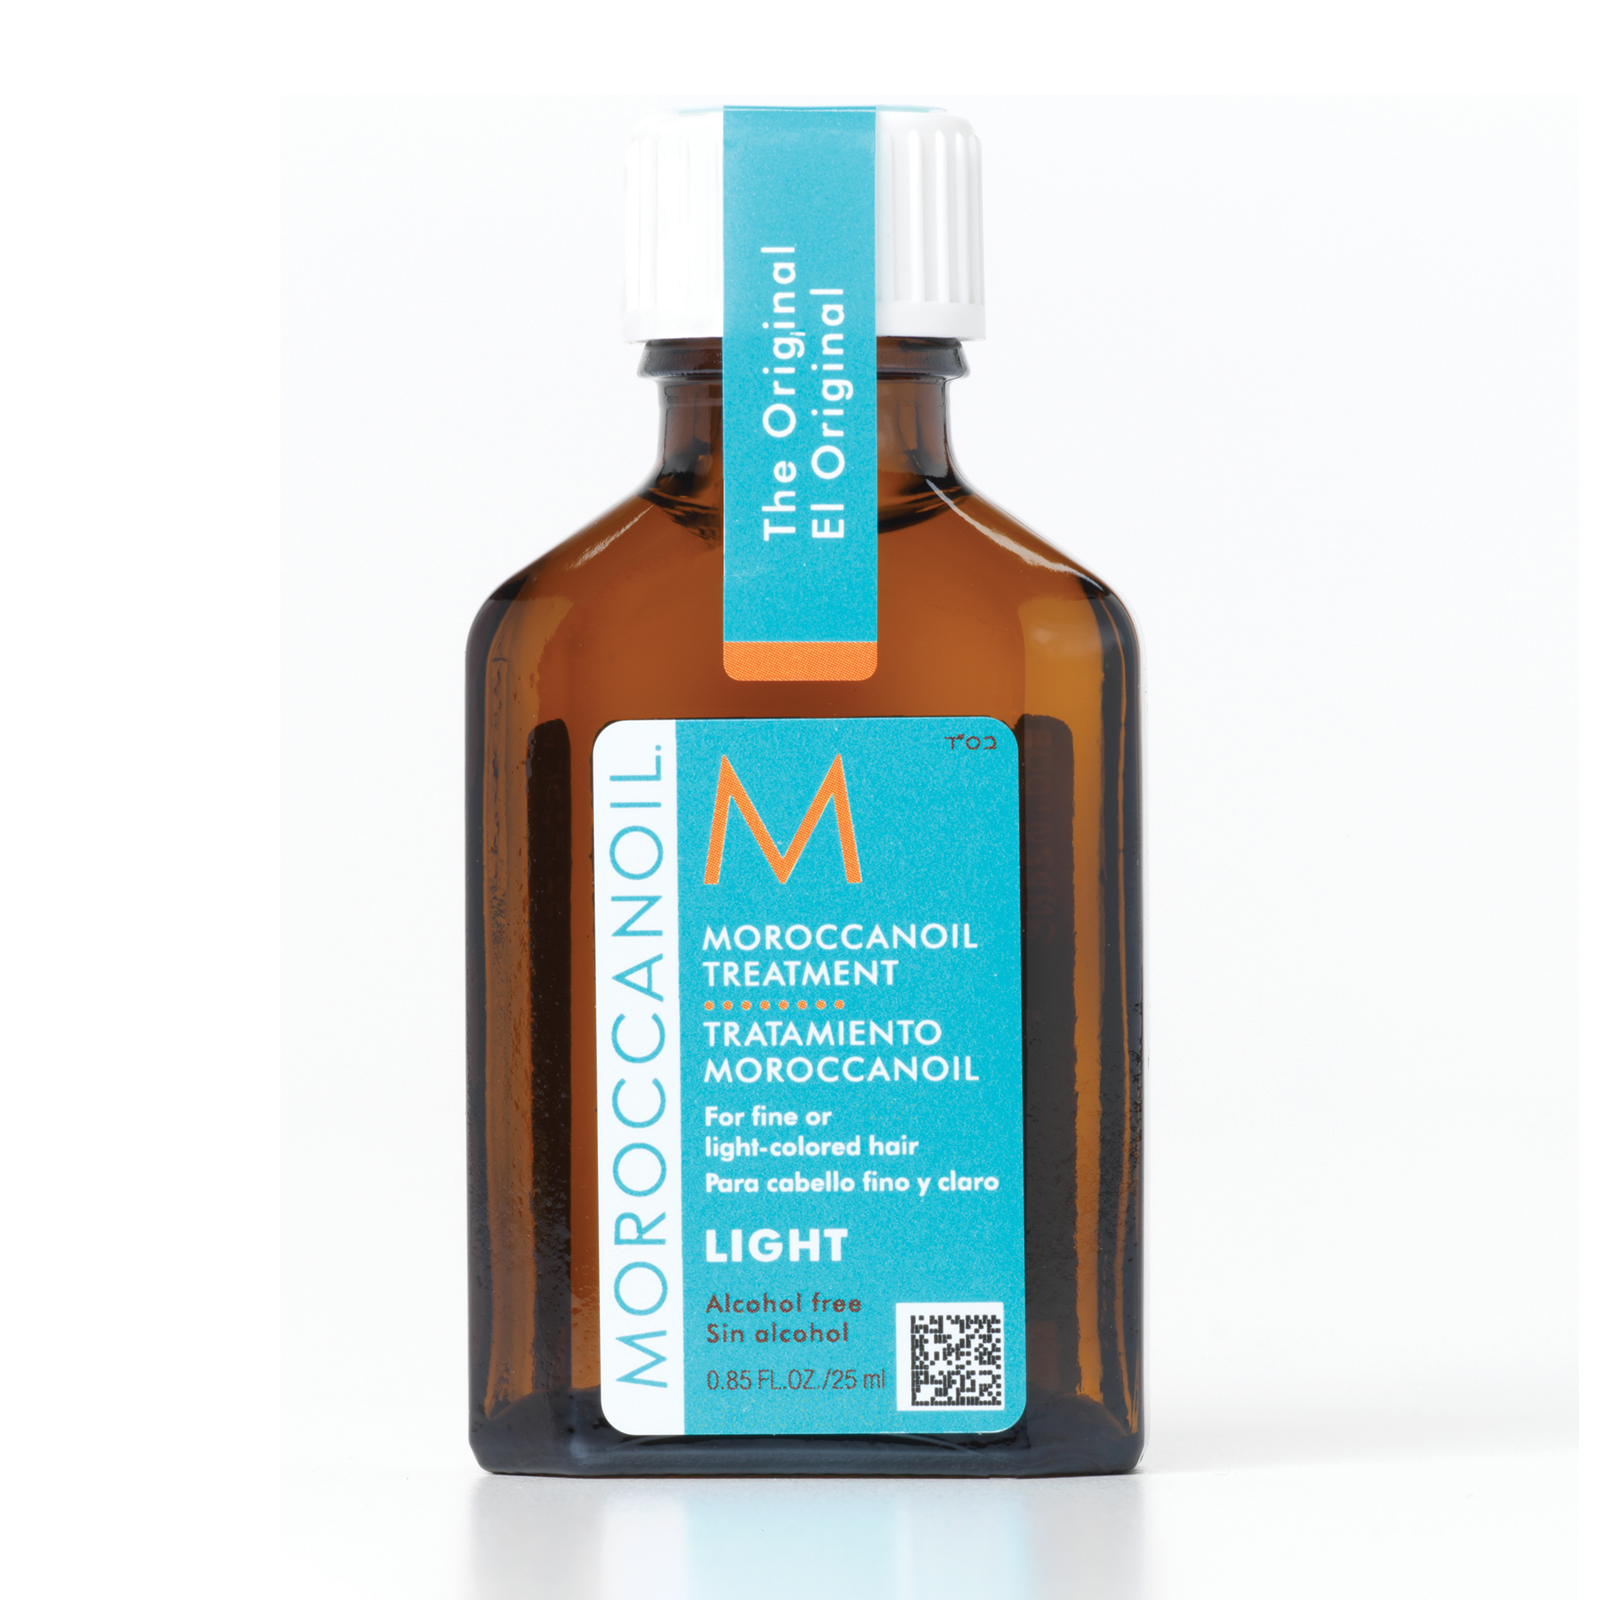 Moroccanoil_Treatment_Light_25ml_1392288232